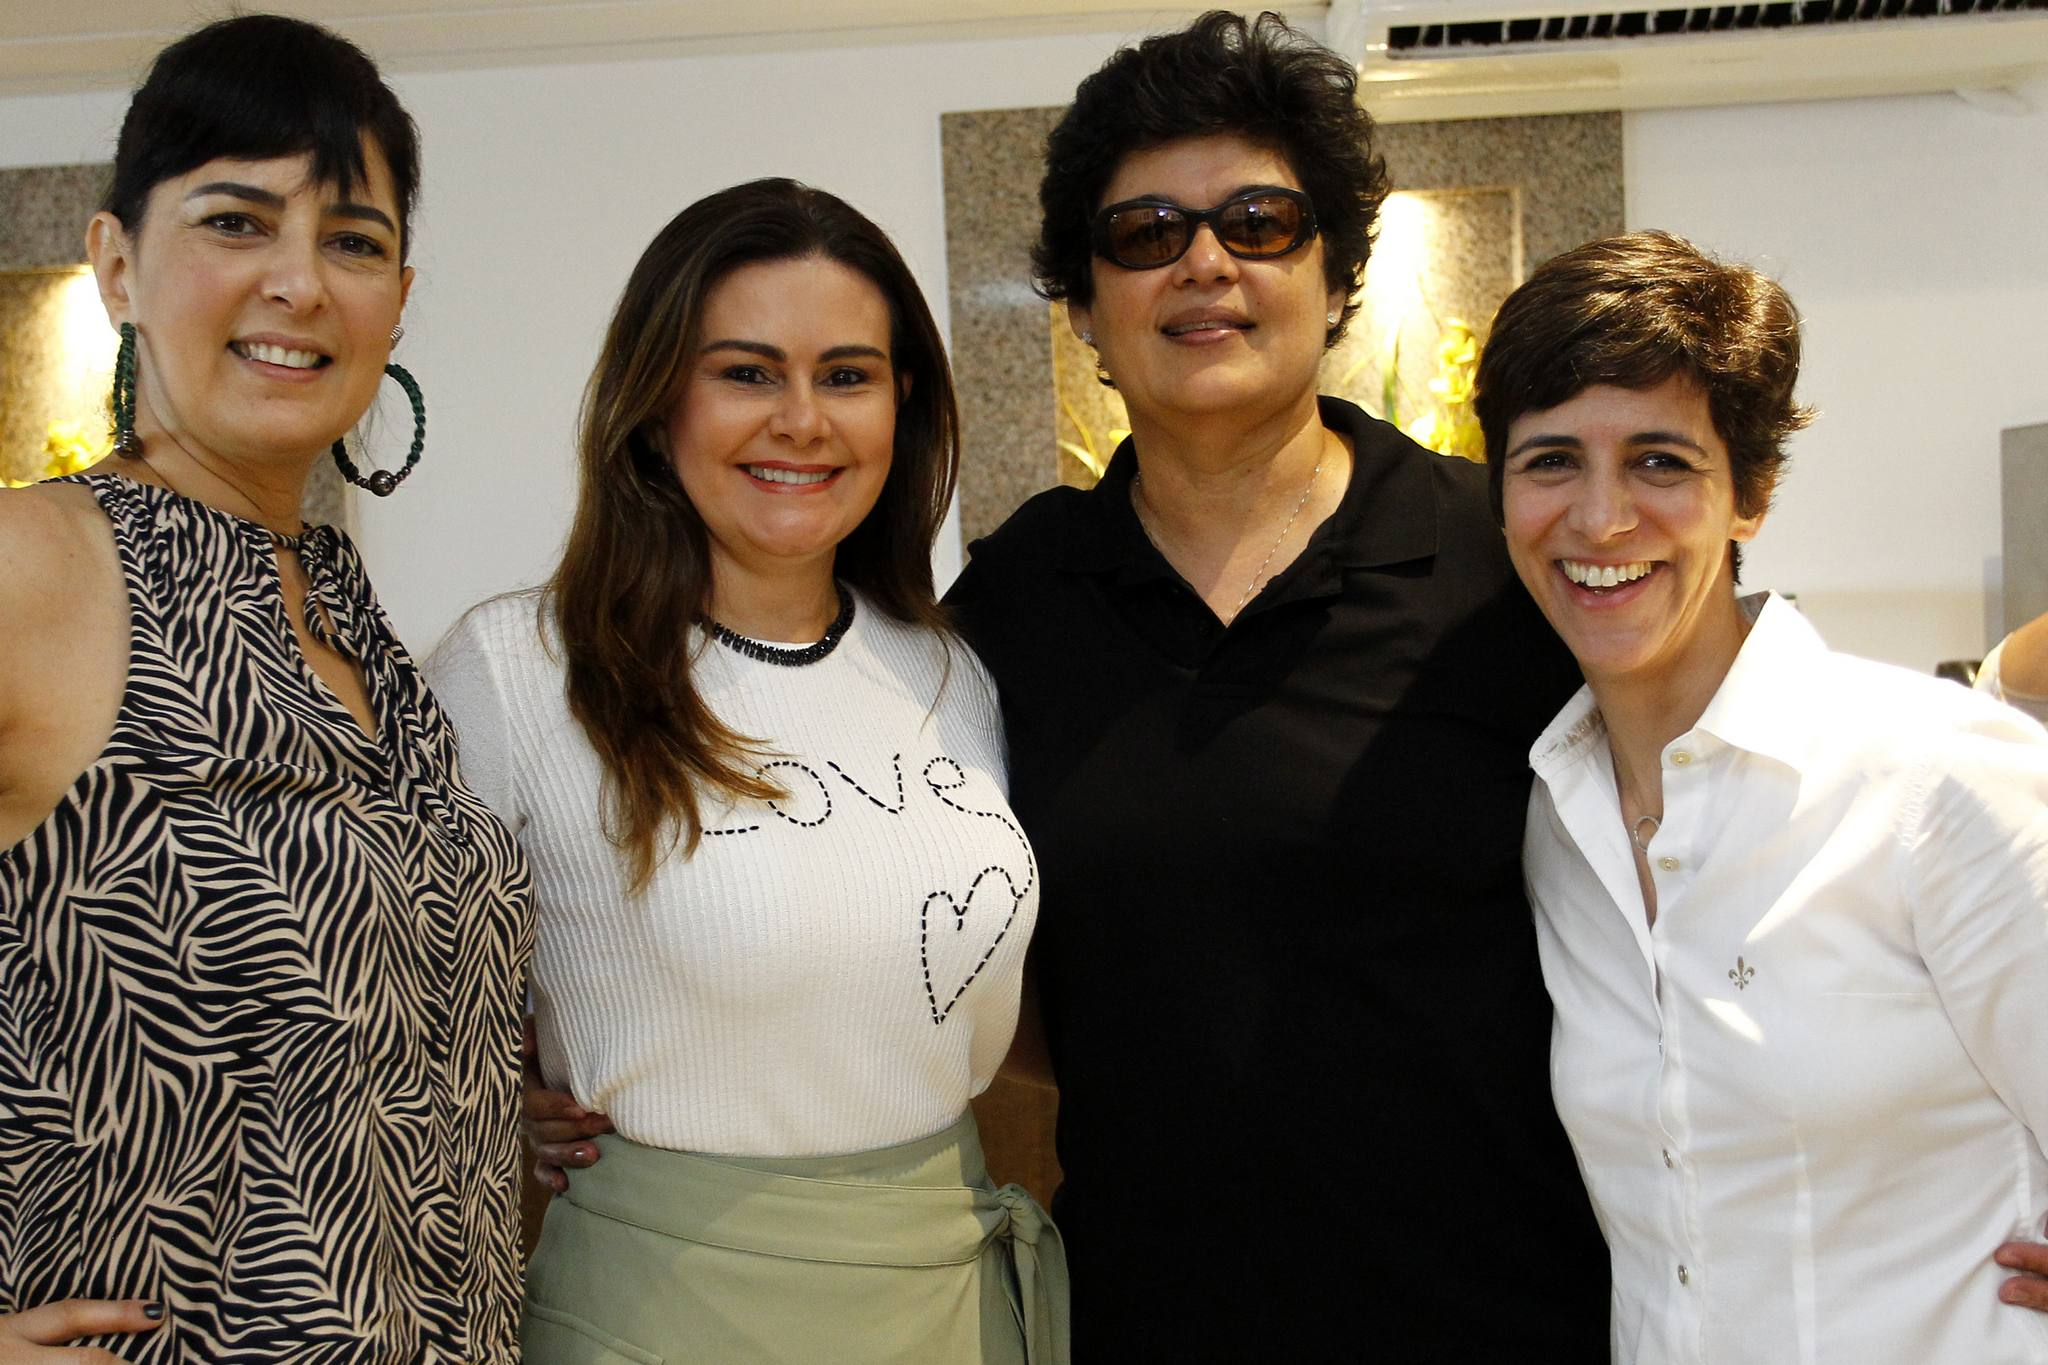 Armenui Boyadjian, Ivana Bezerra, Cordelia Queiroz E Simone Moura